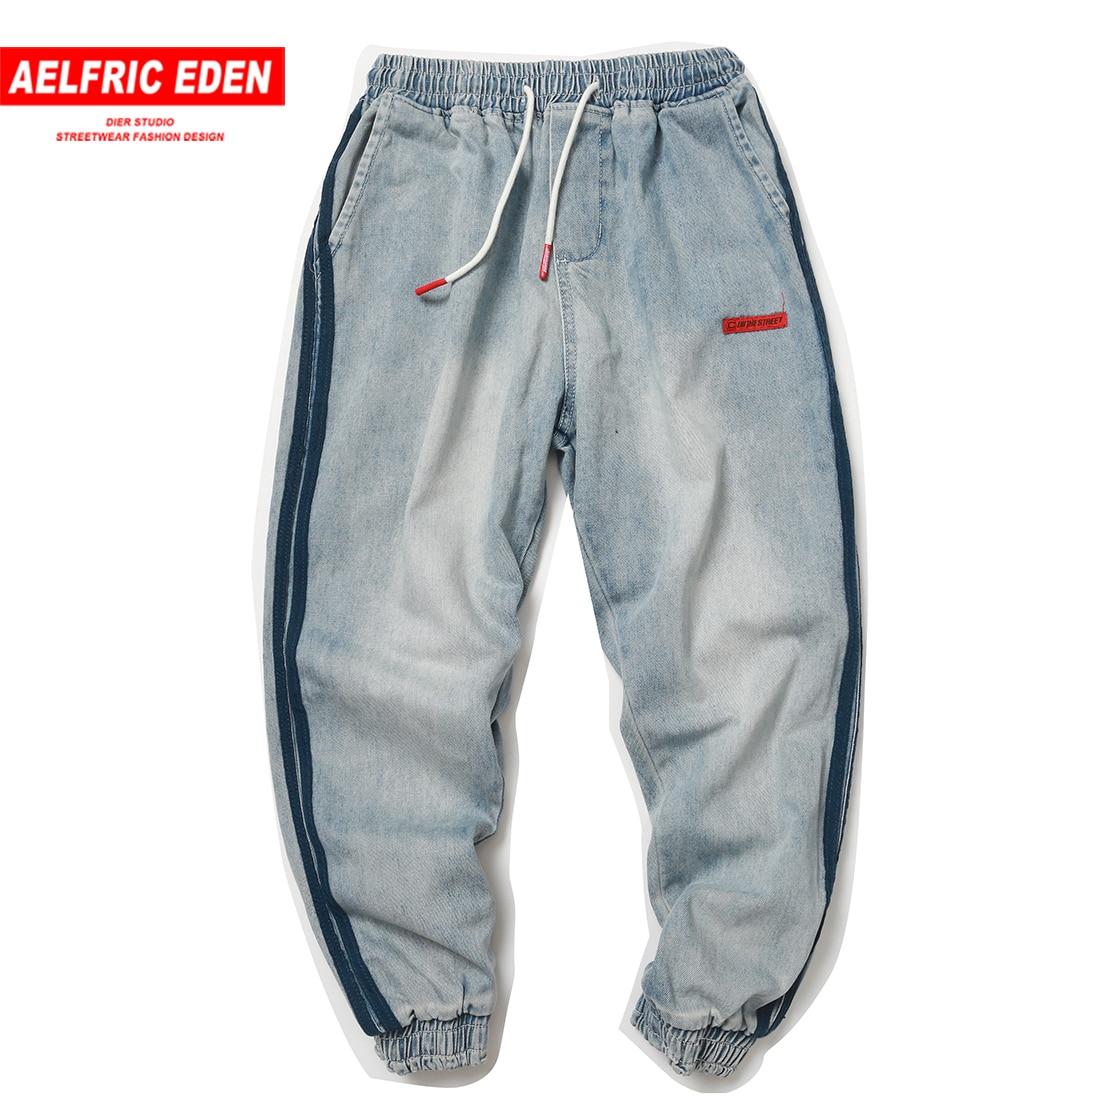 Aelfric Eden Hip Hop Swag Side Stripe Denim Fabric Men Pants 2018 Fashion Harajuku High Street Male Casual Pants Streetwear UR76